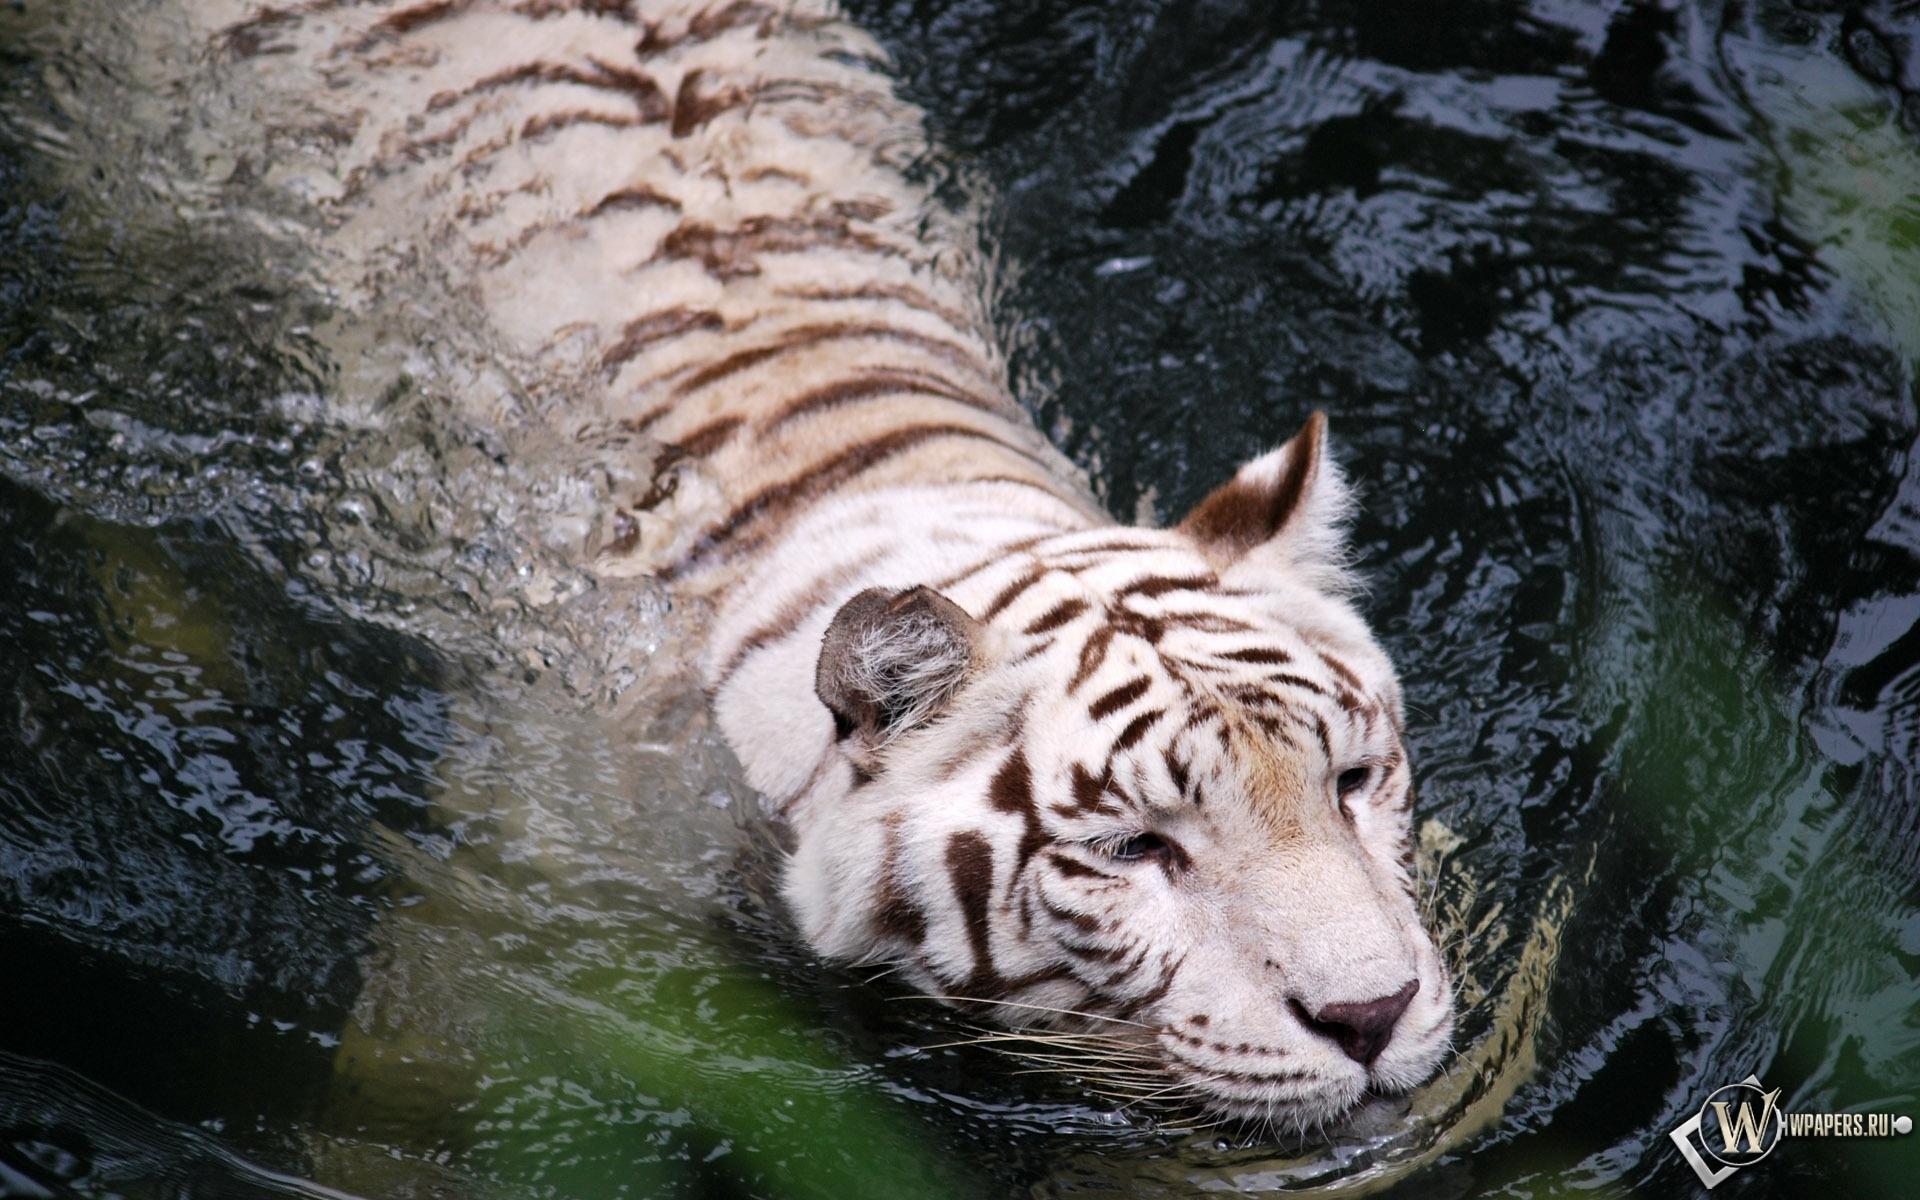 Плывущий тигр-альбинос 1920x1200